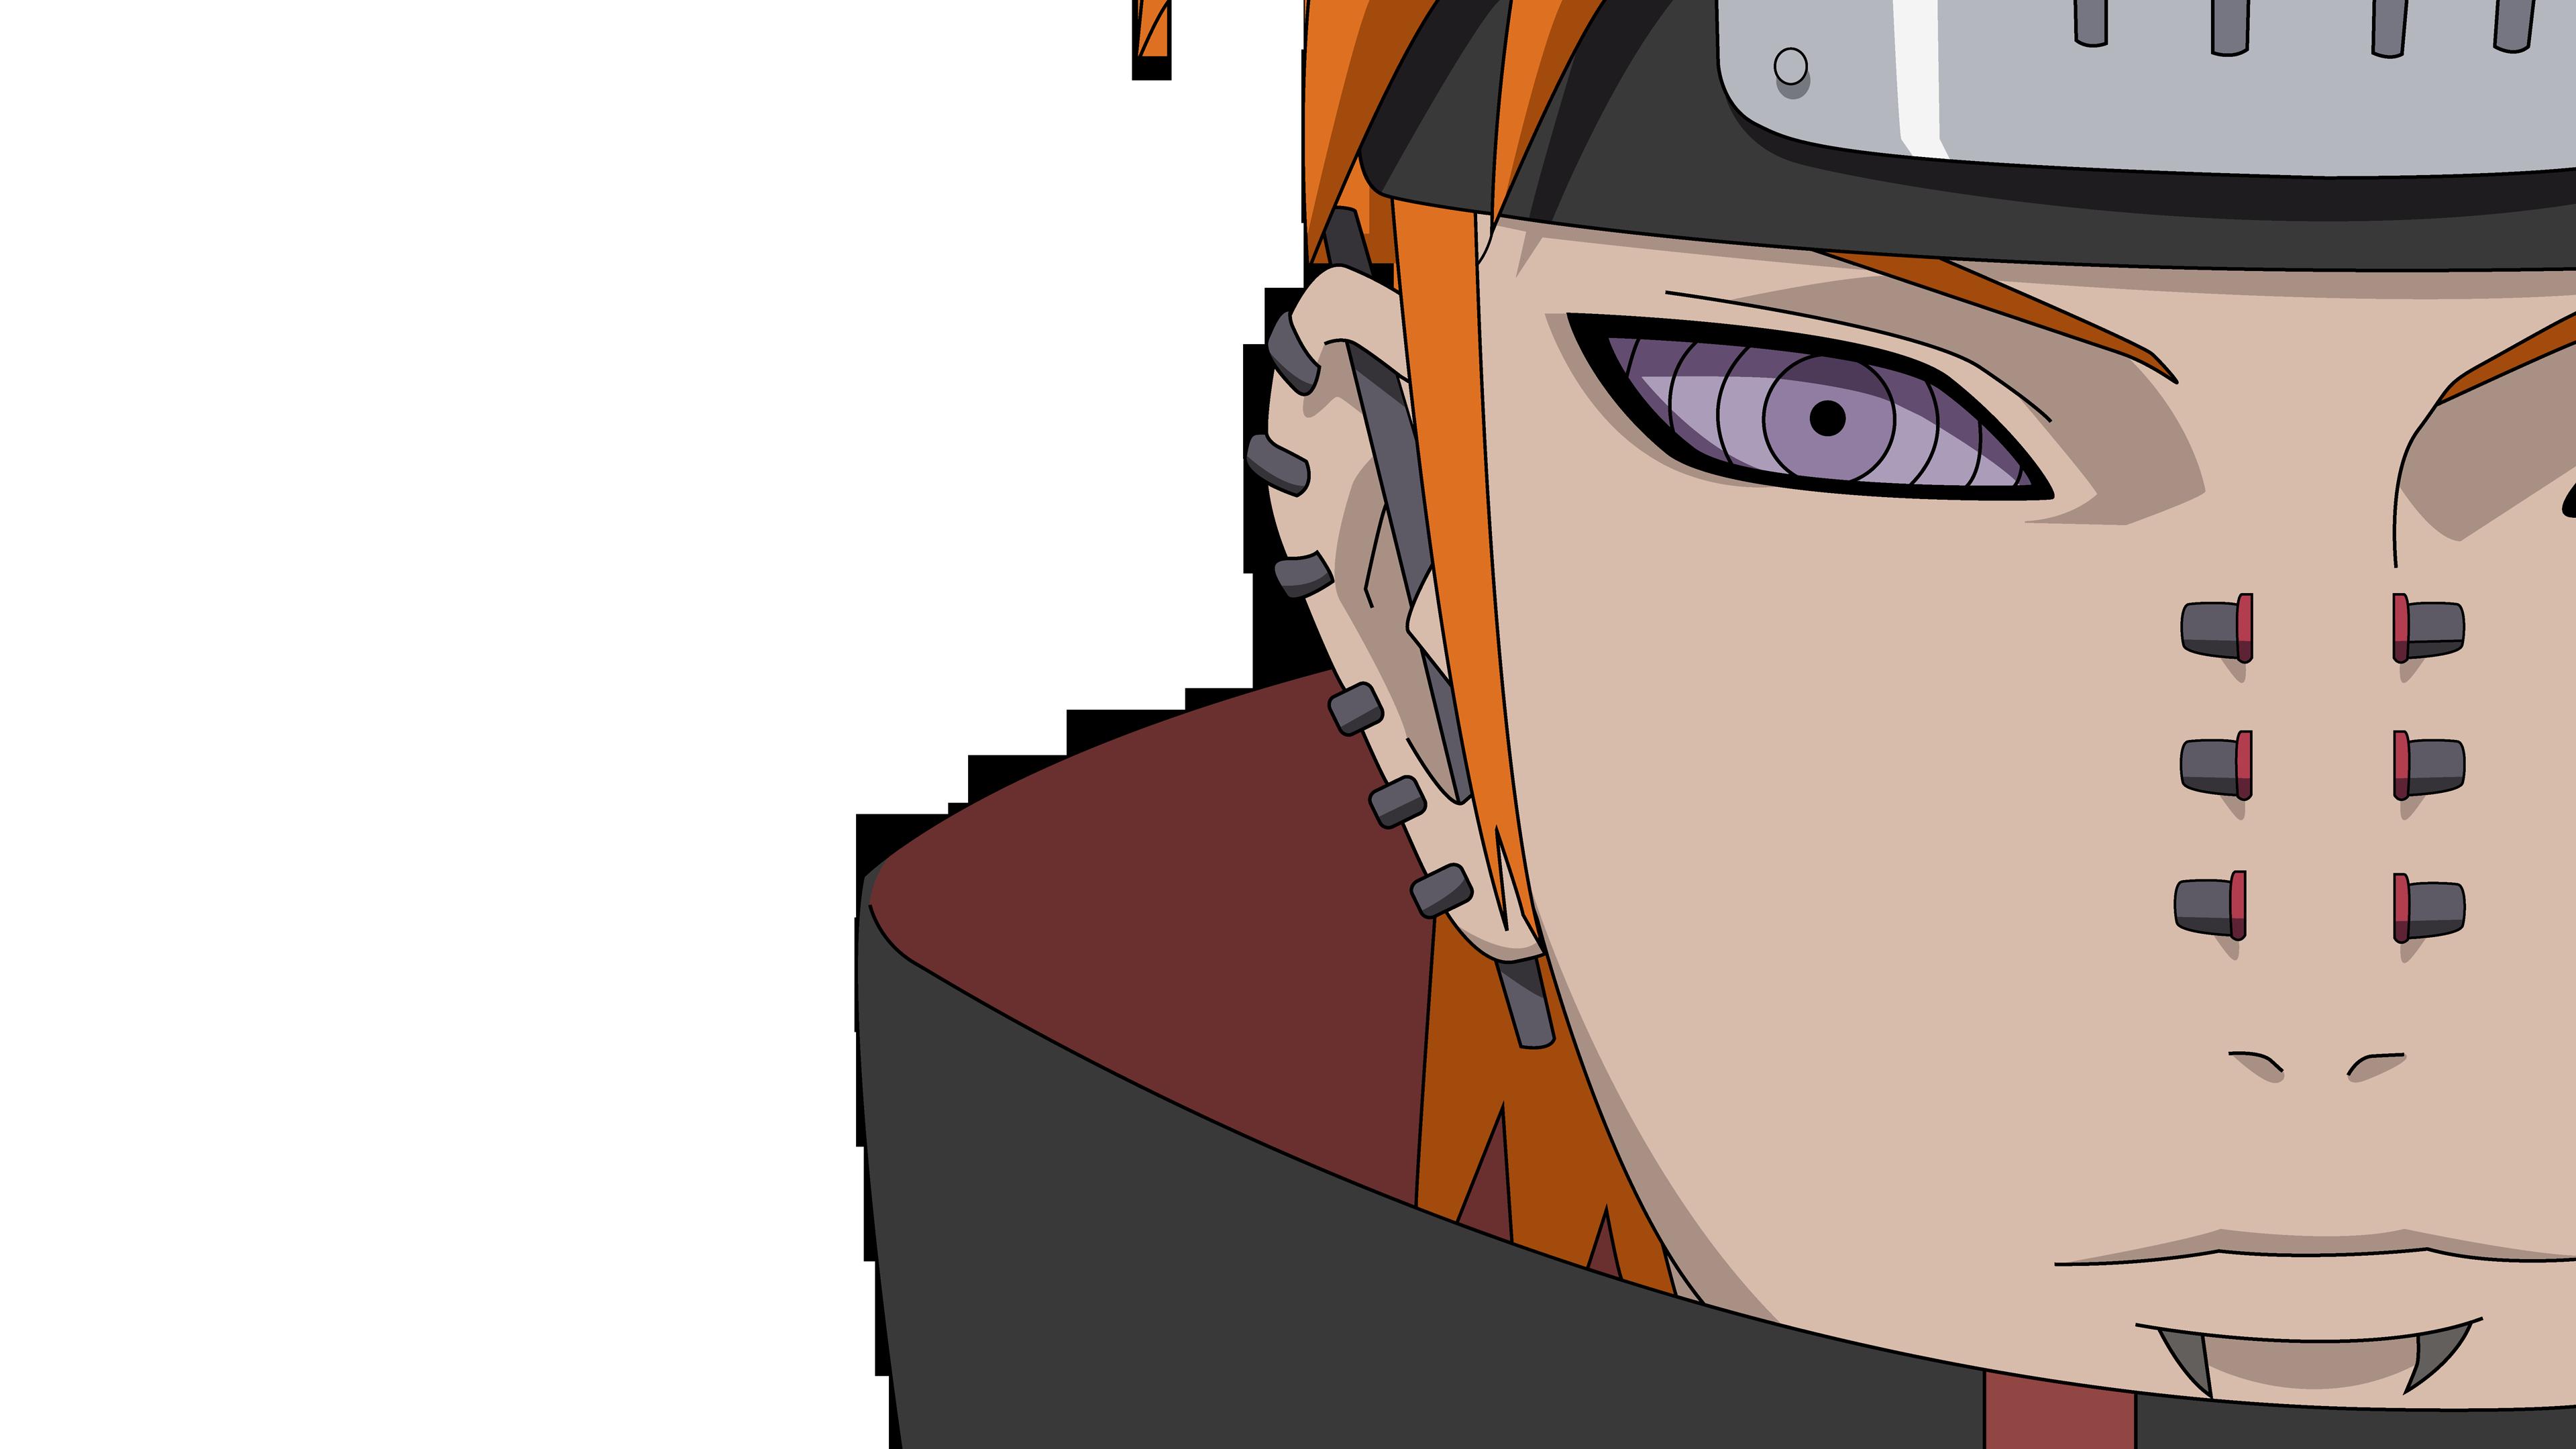 Transparent Anime Pfp 1080 X 1080